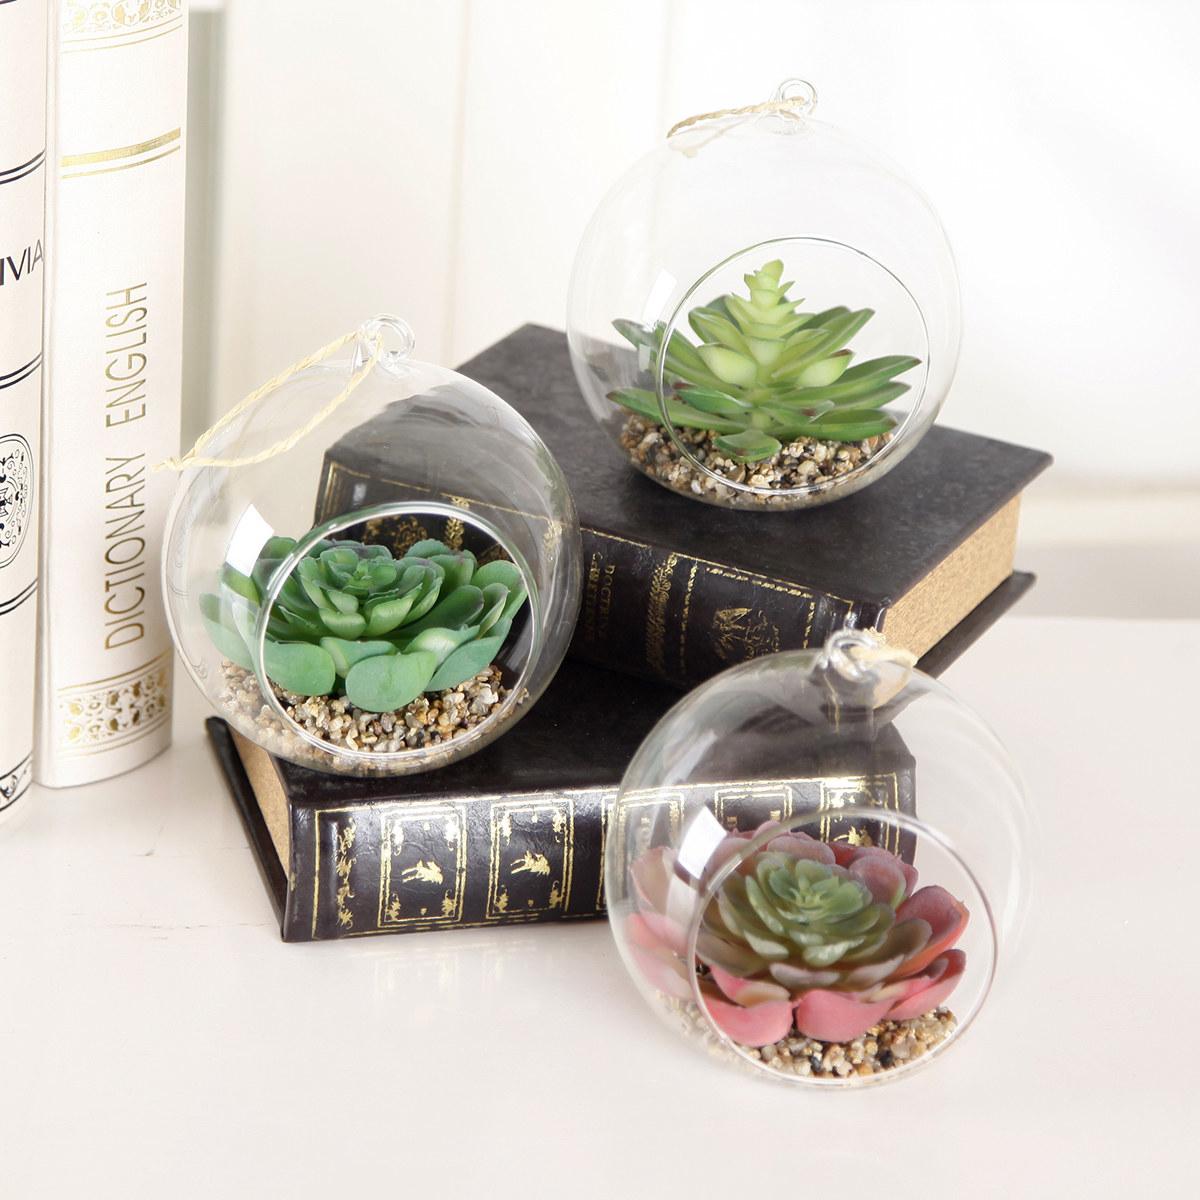 Three fake succulents in open round glass terrariums